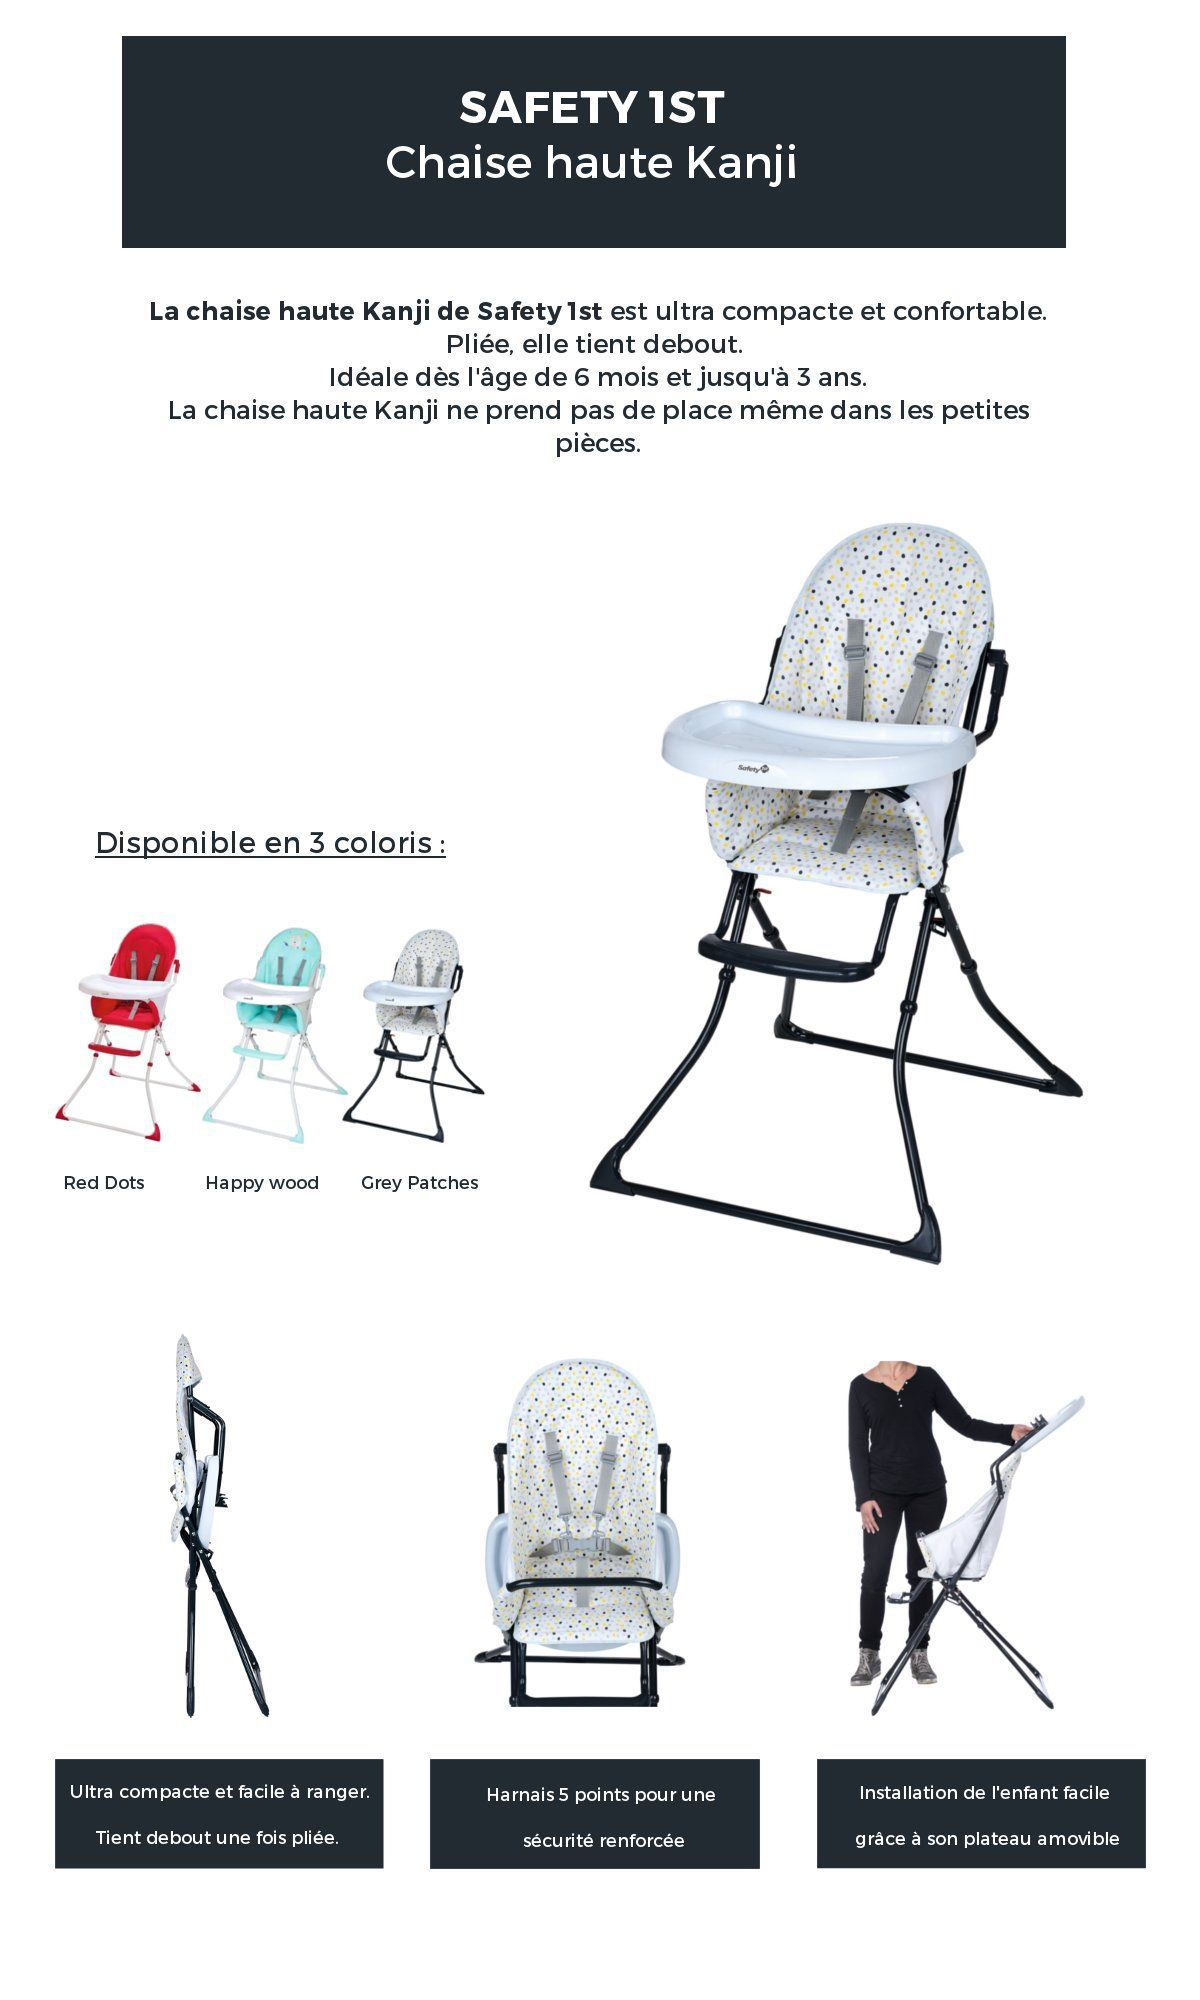 destockage safety 1st chaise haute kanji grey patches chaise haute au meilleur prix soldes. Black Bedroom Furniture Sets. Home Design Ideas